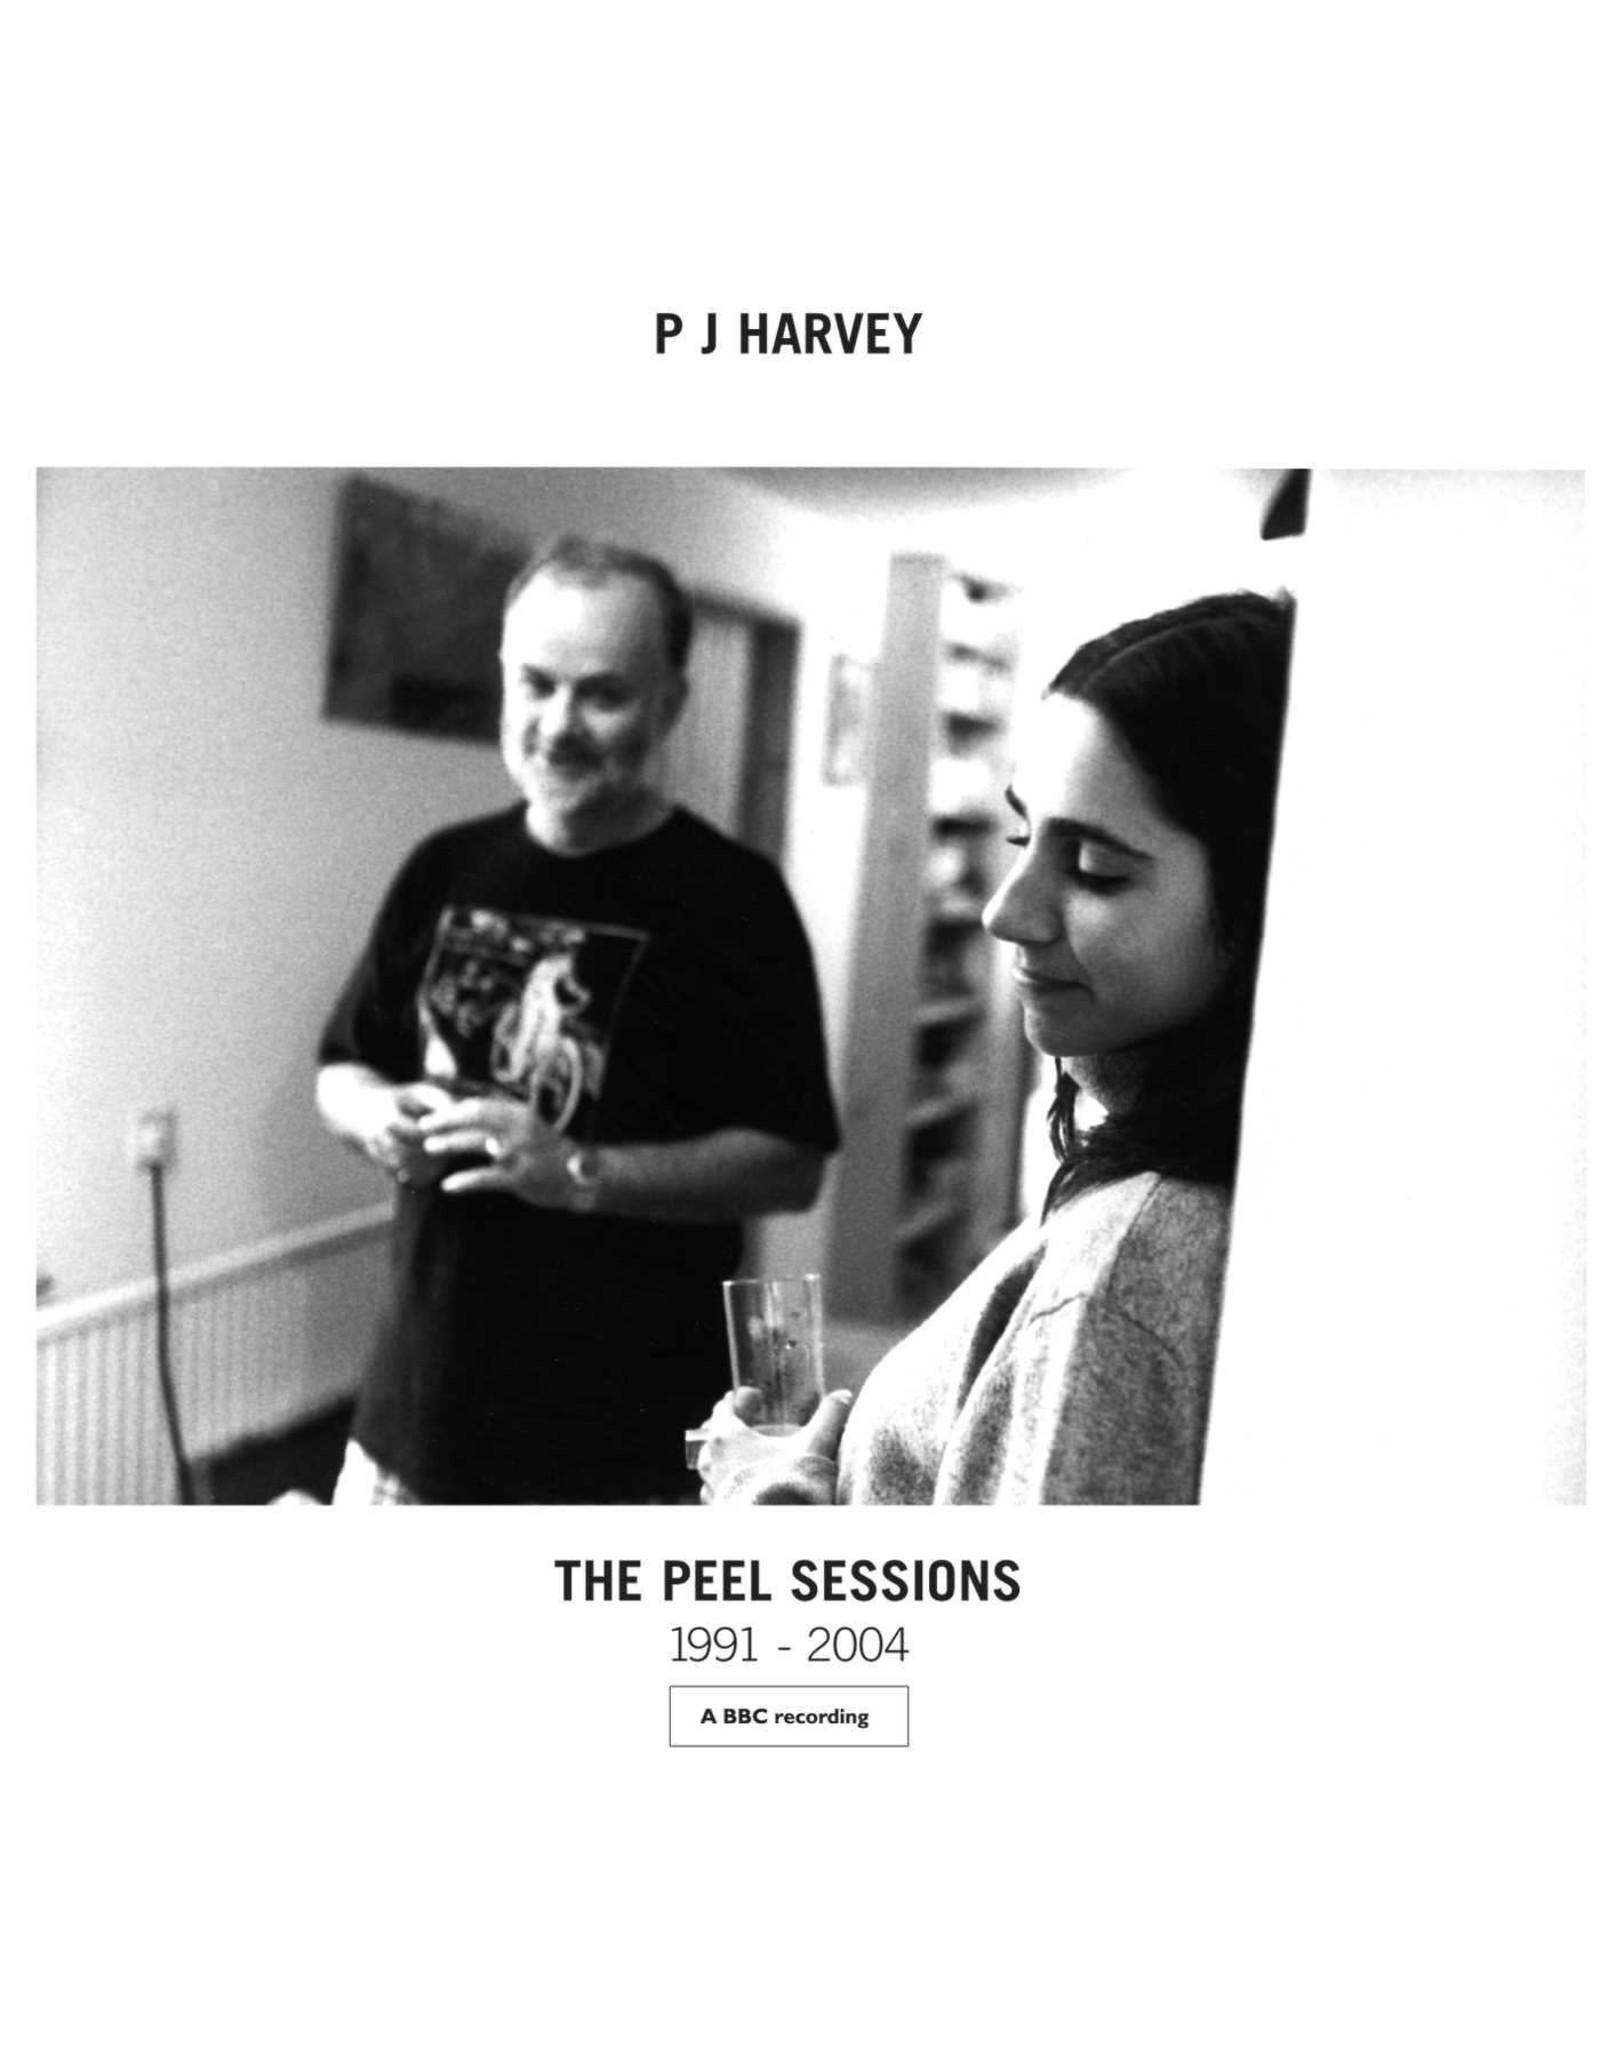 New Vinyl PJ Harvey - The Peel Sessions 1991-2004 LP